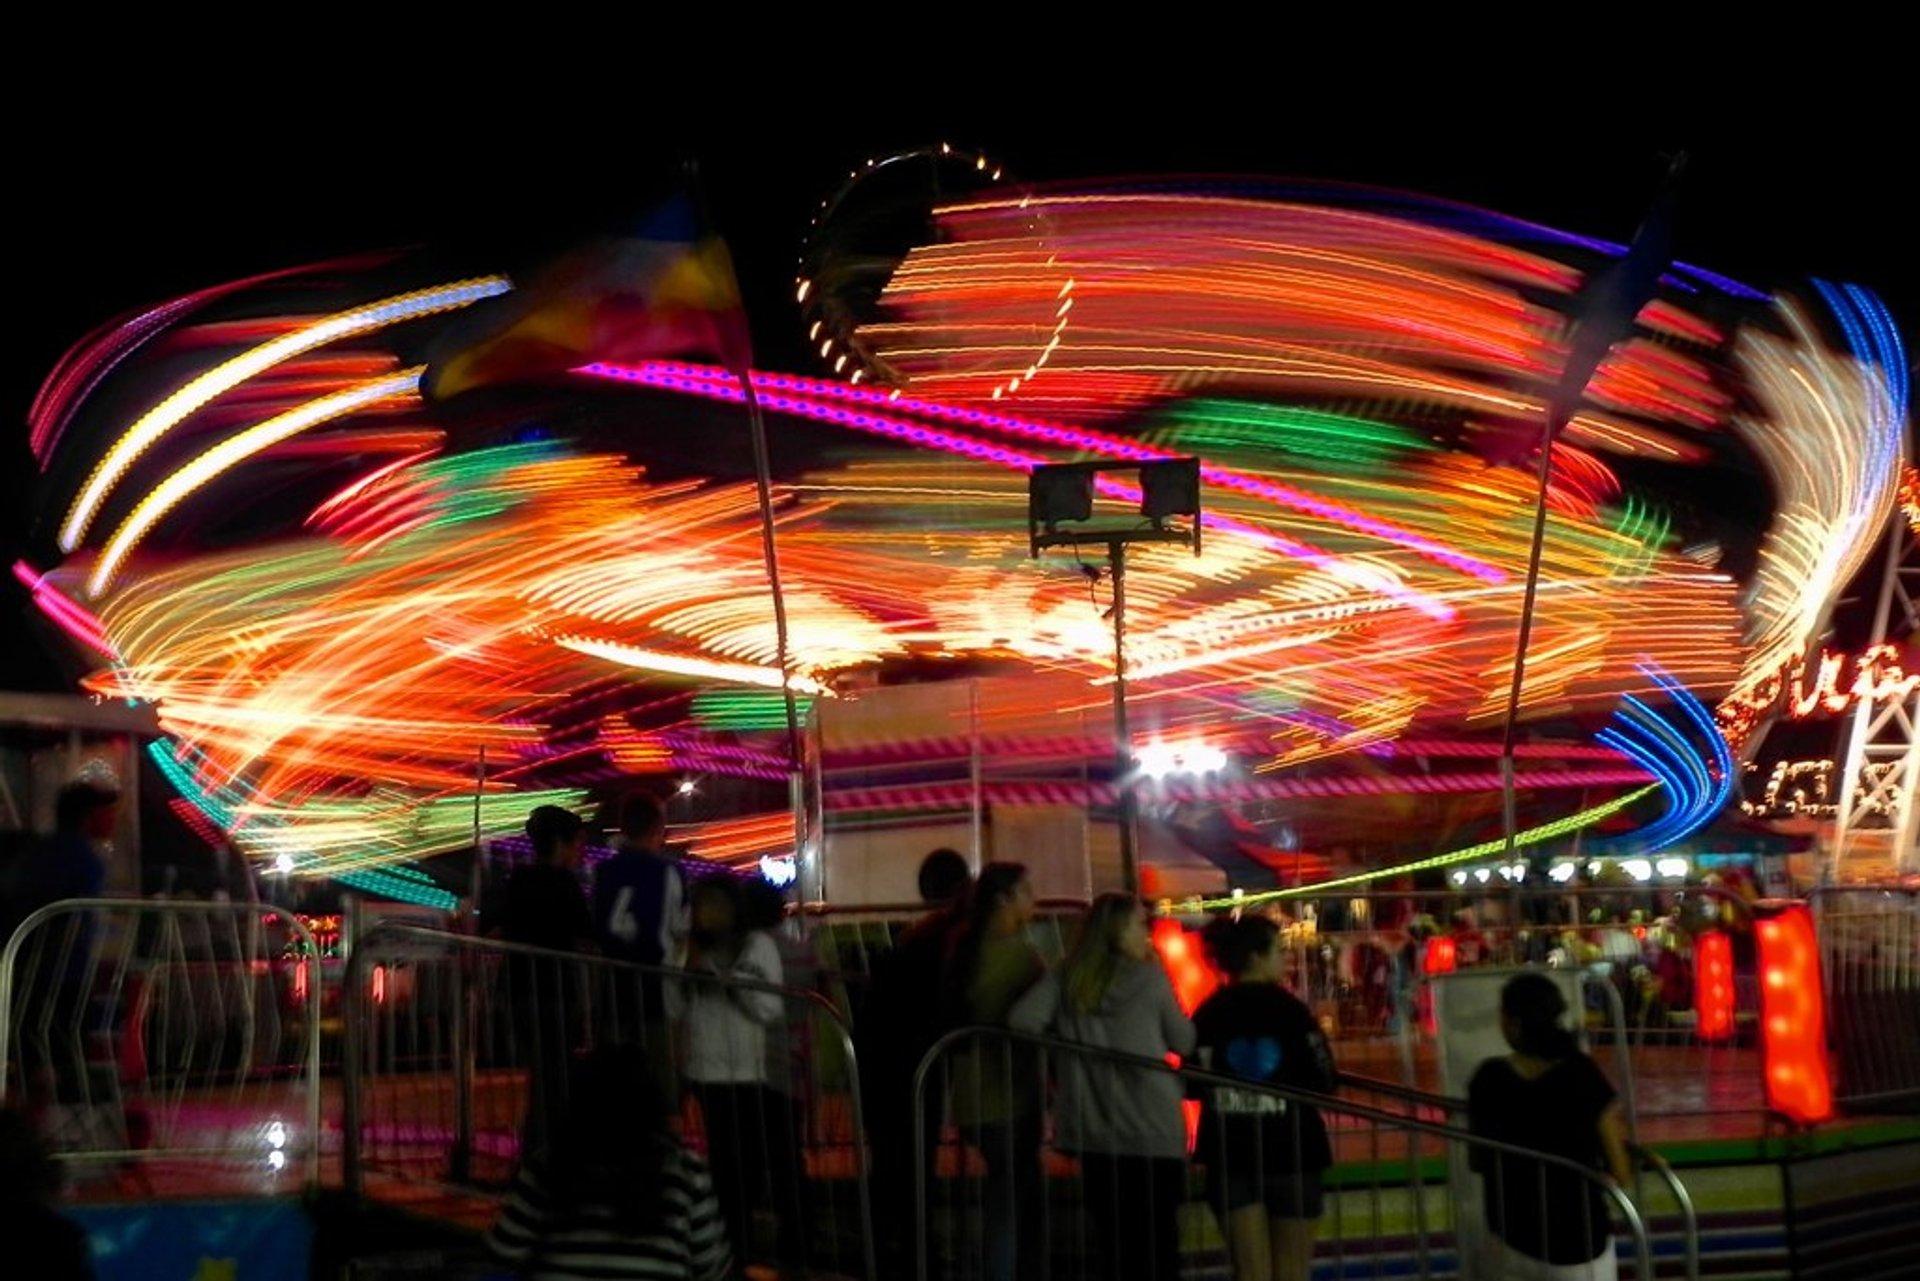 South Florida Fair 2021 - Dates & Map pertaining to South Florida Fairgrounds Events 2021